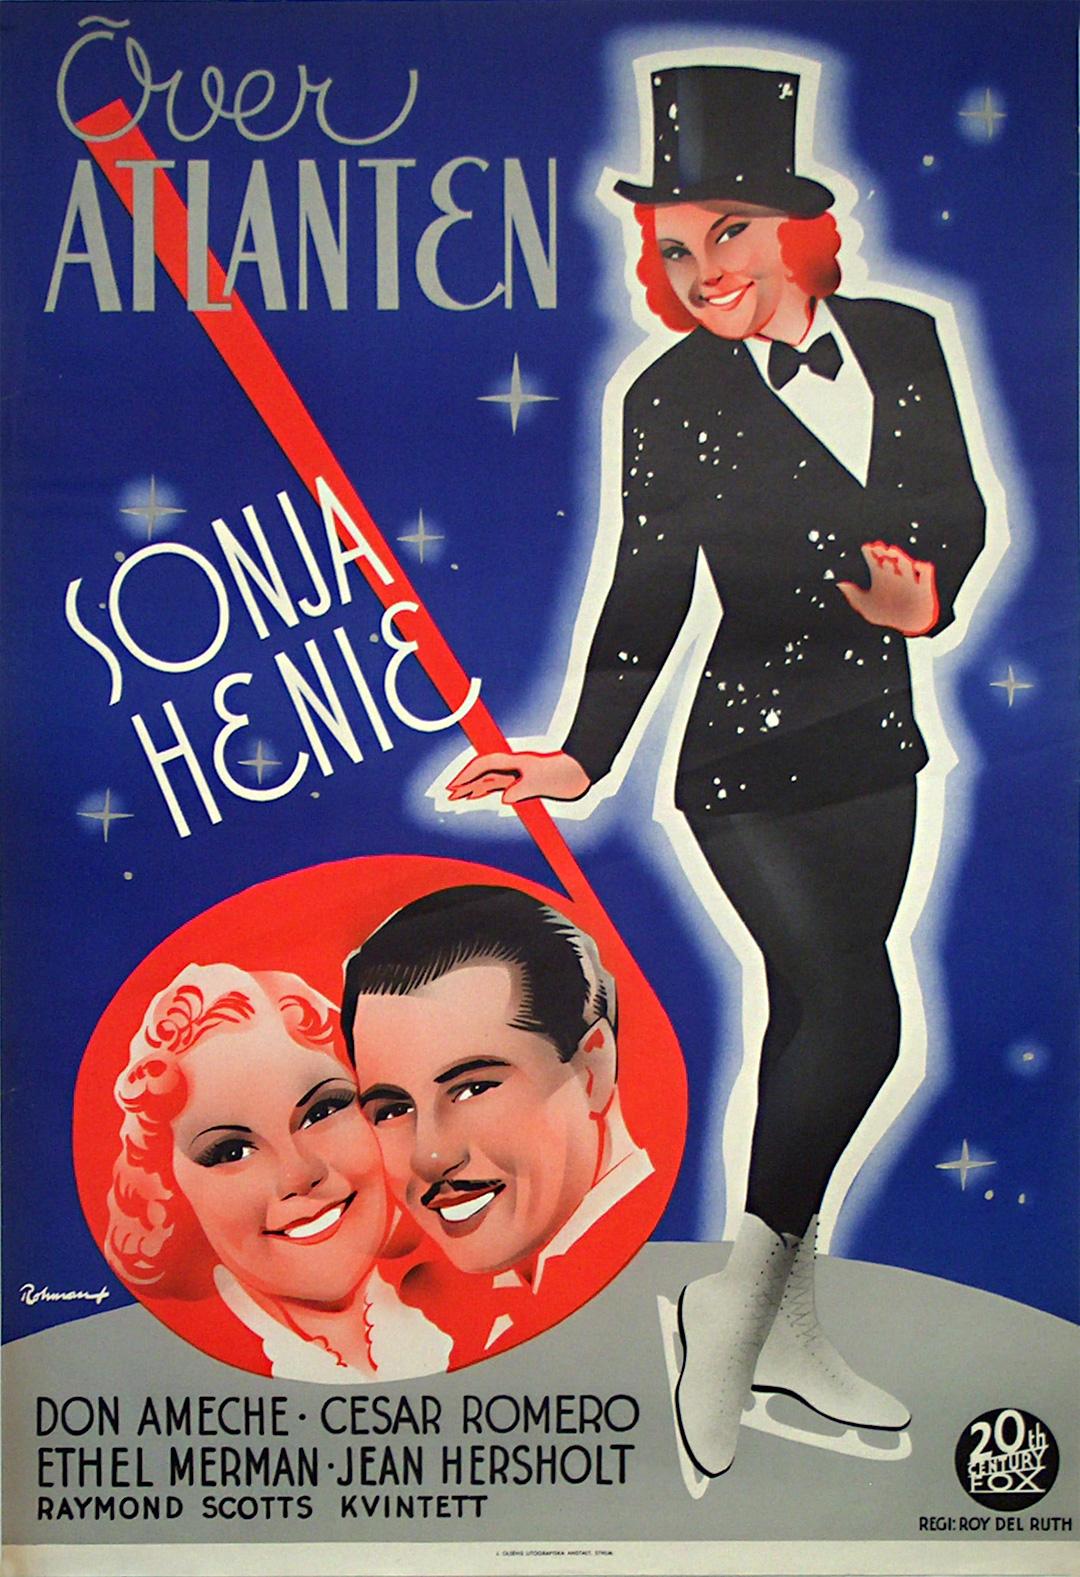 Original vintage movie posters for sale